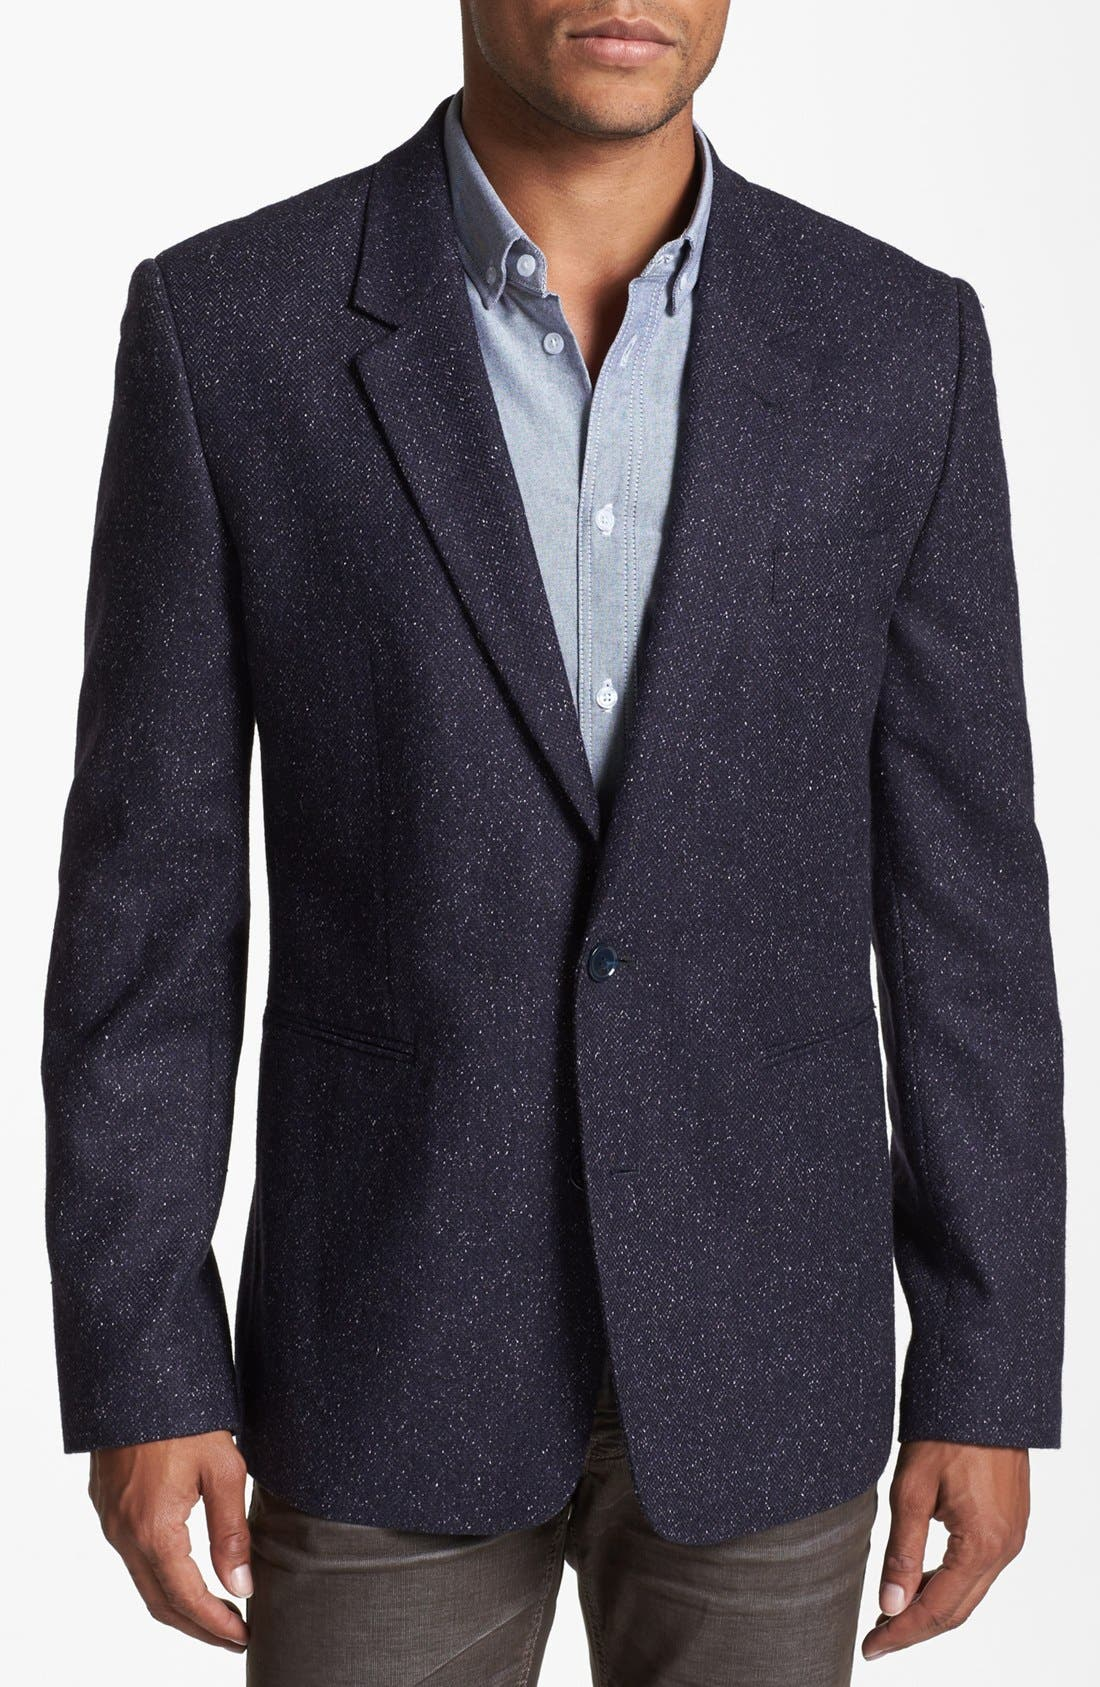 Alternate Image 1 Selected - Slate & Stone Tweed Blazer